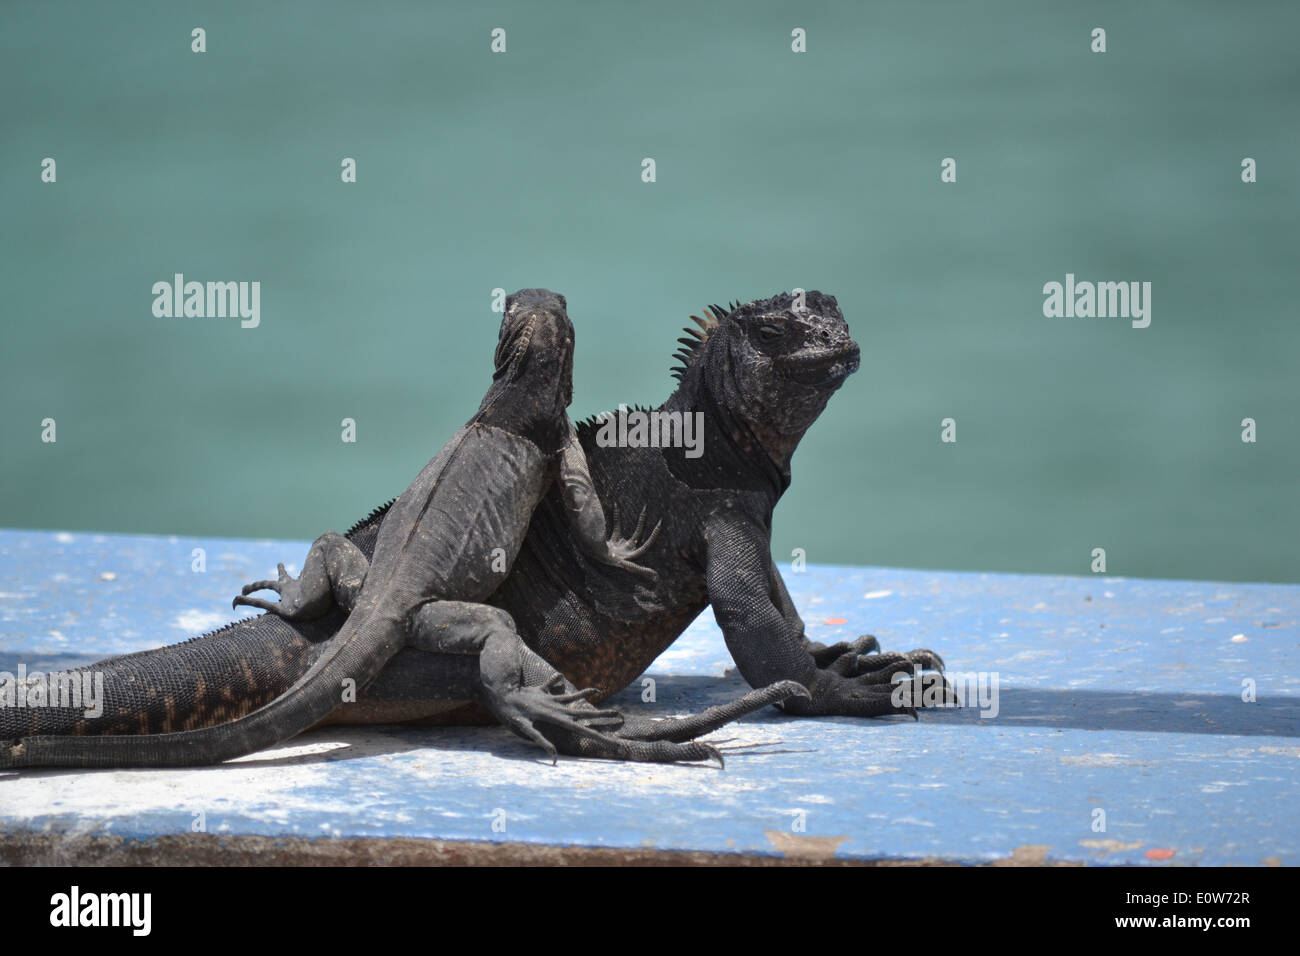 Mom and her baby iguana - Stock Image